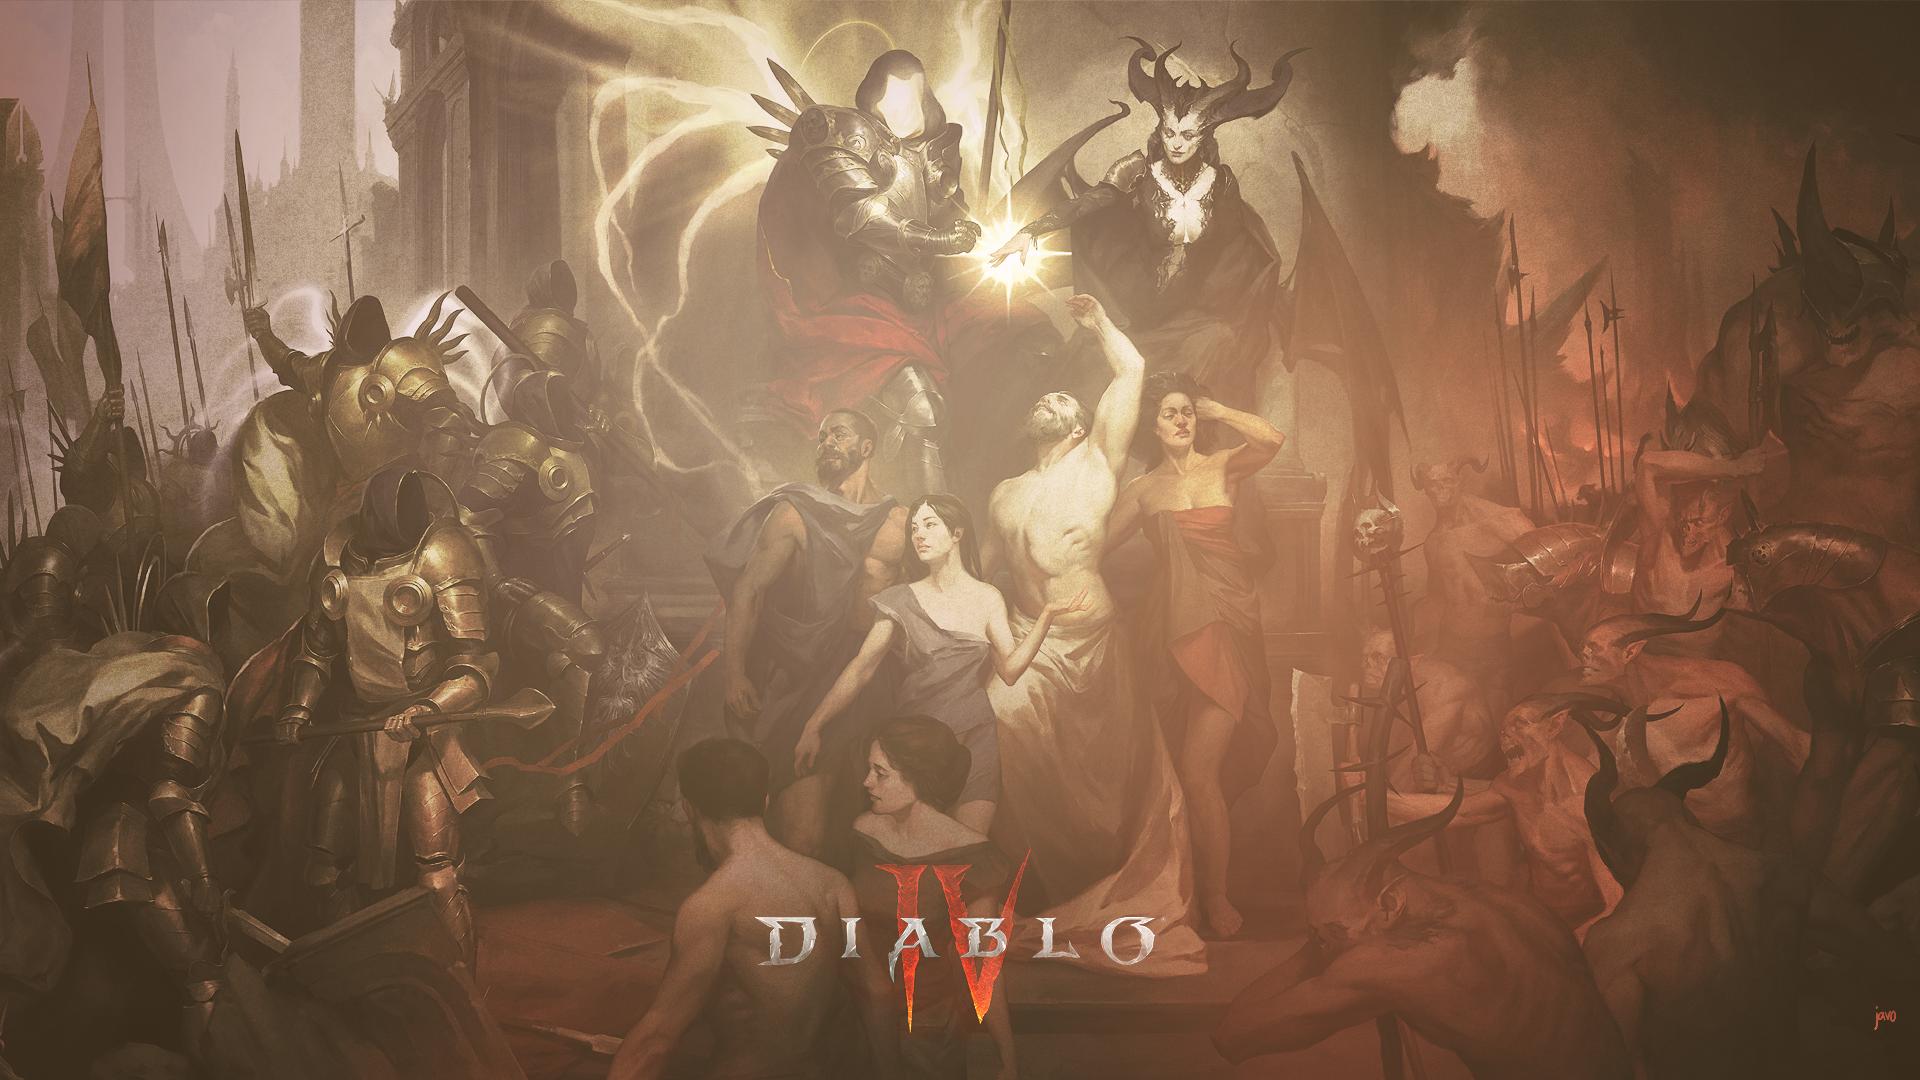 General 1920x1080 diablo 4 diablo iv Diablo RPG Lilith Lilith (Diablo) sanctuary javo Blizzard Entertainment BlizzCon